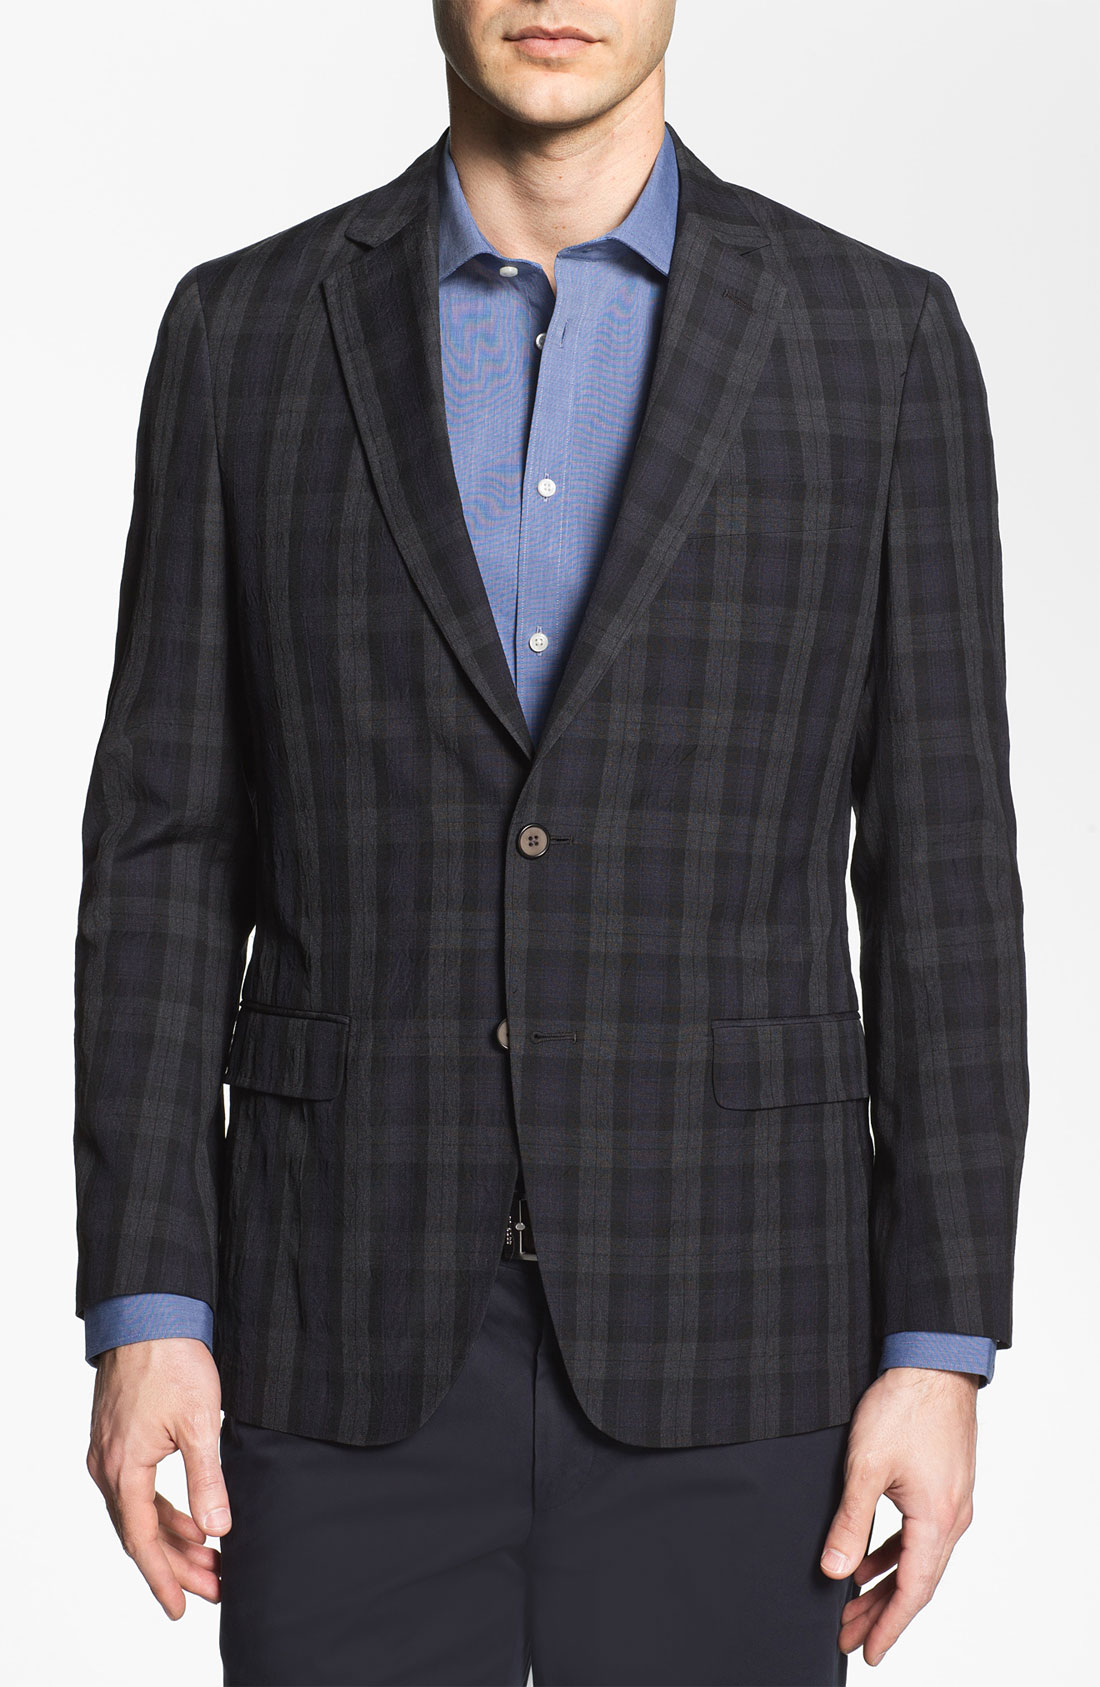 Michael Kors Trim Fit Plaid Wool Sportcoat In Gray For Men